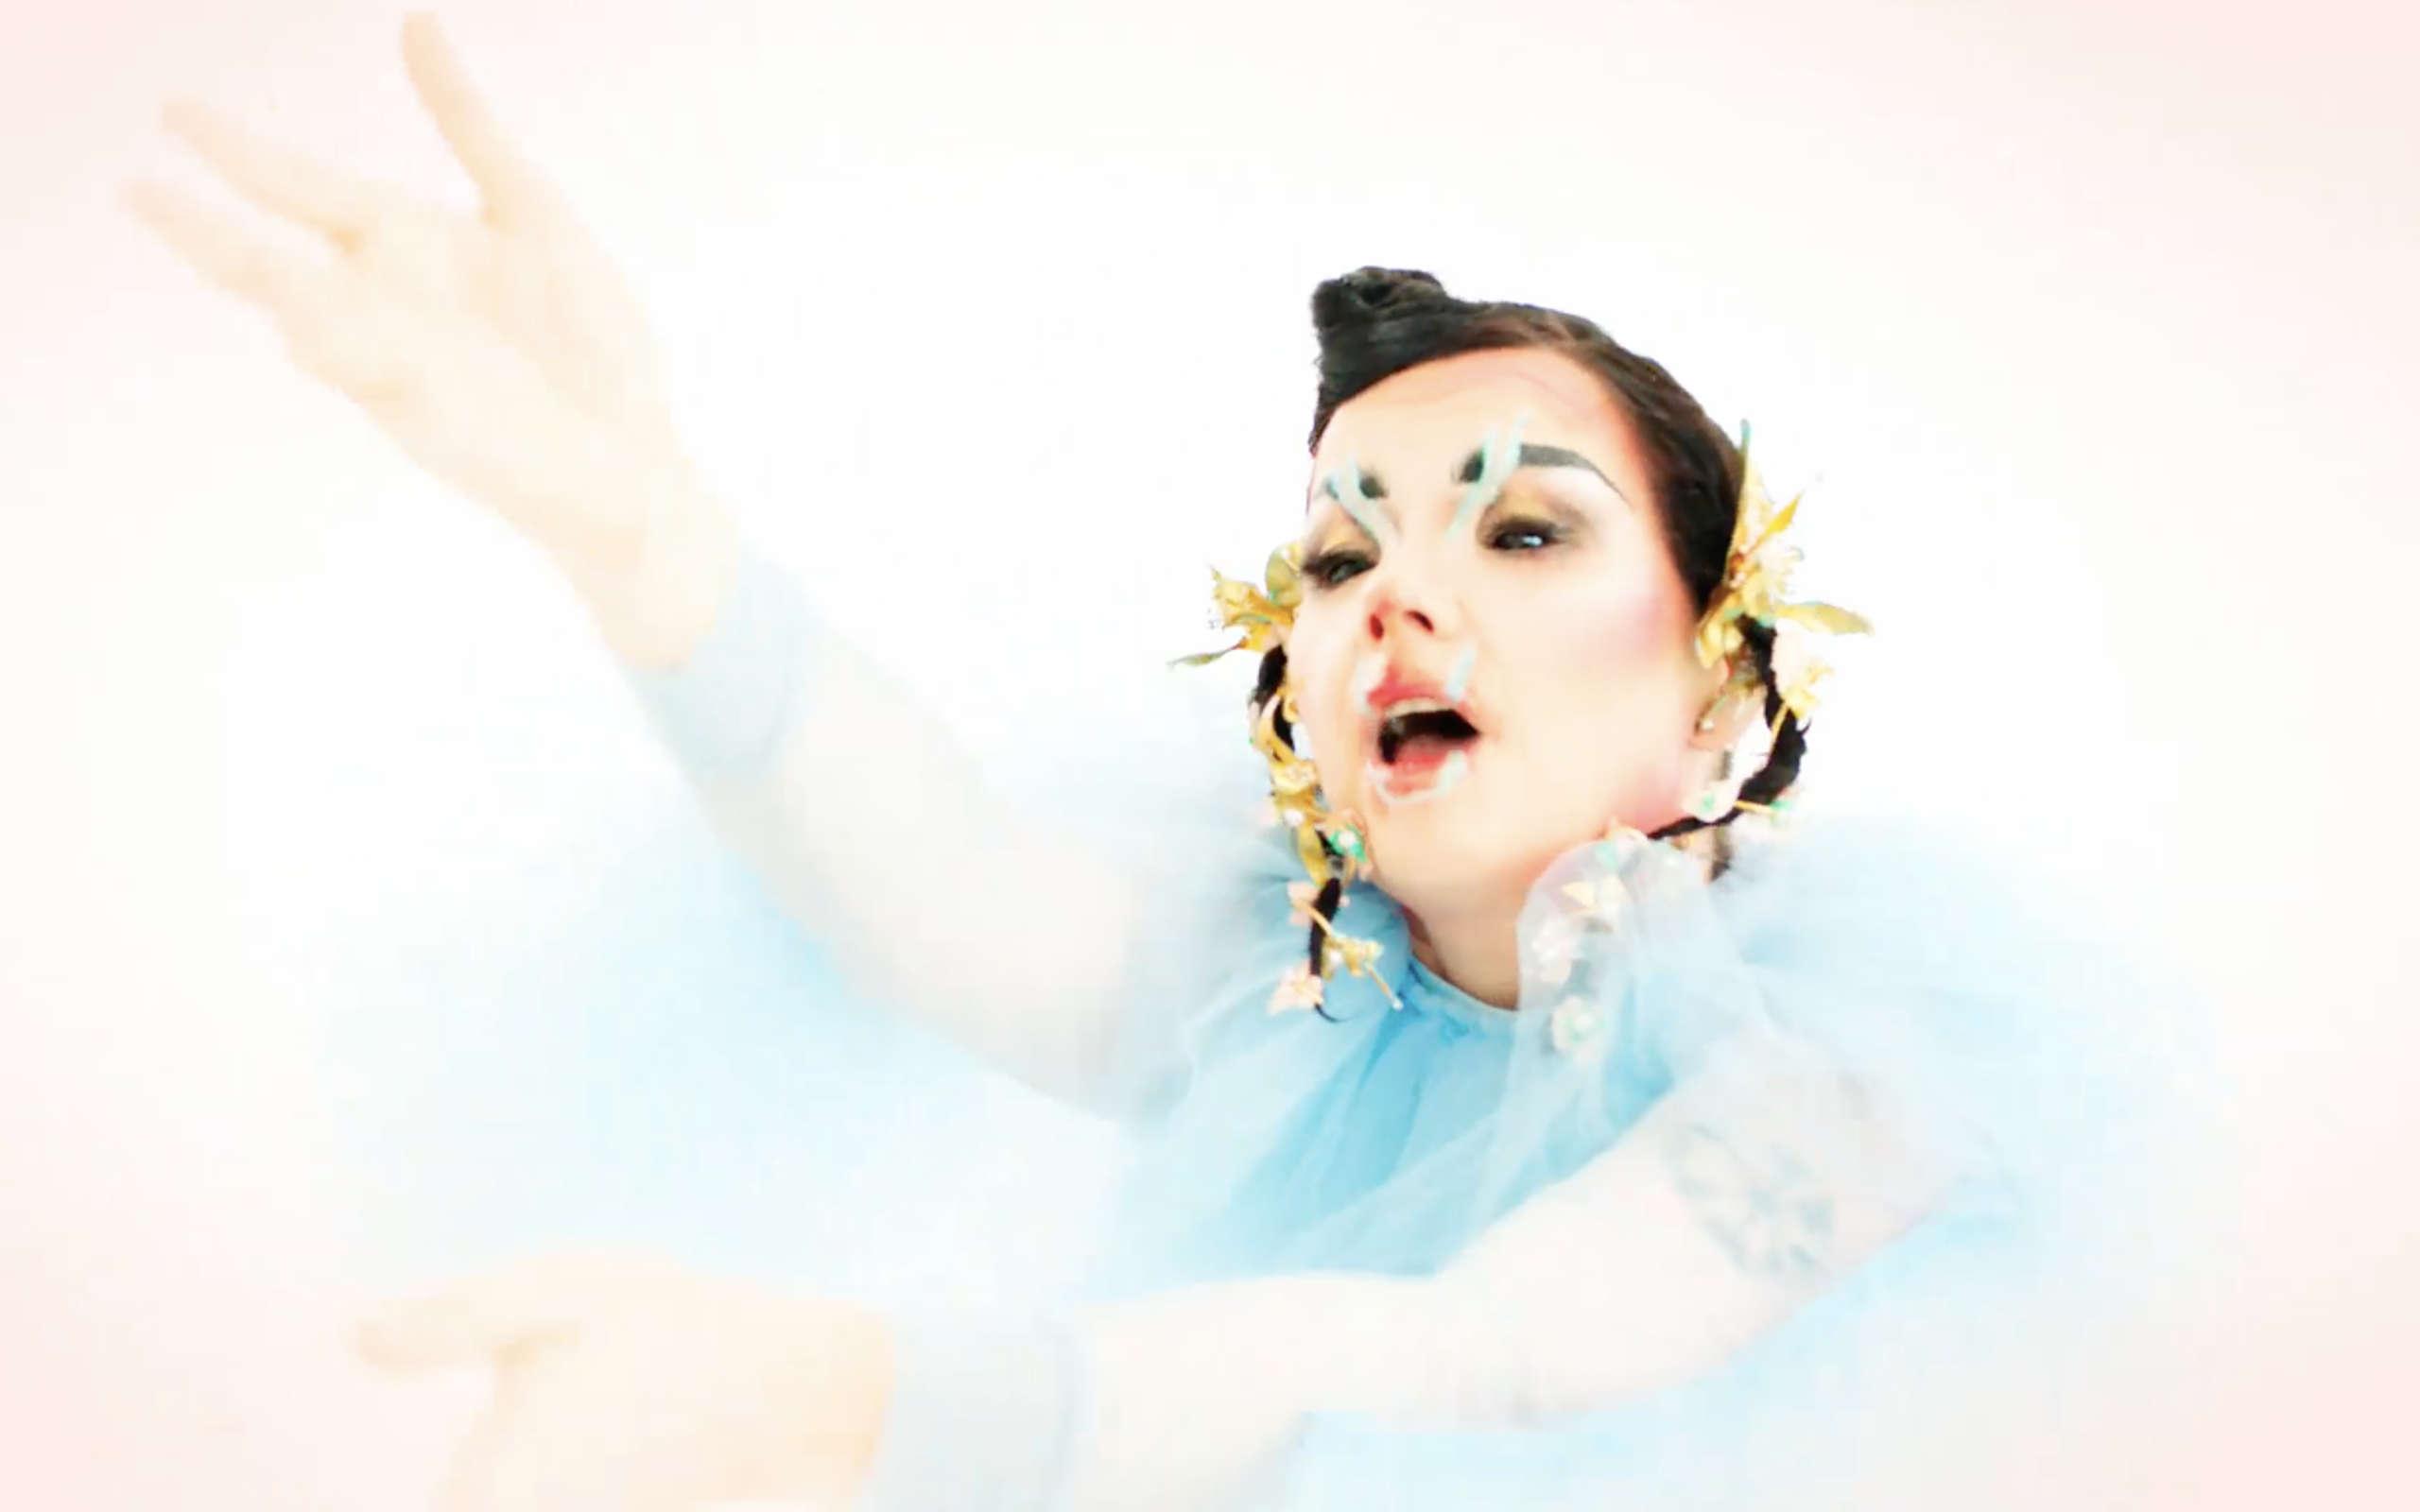 Watch Björk's New Music Video Directed By Tim Walker